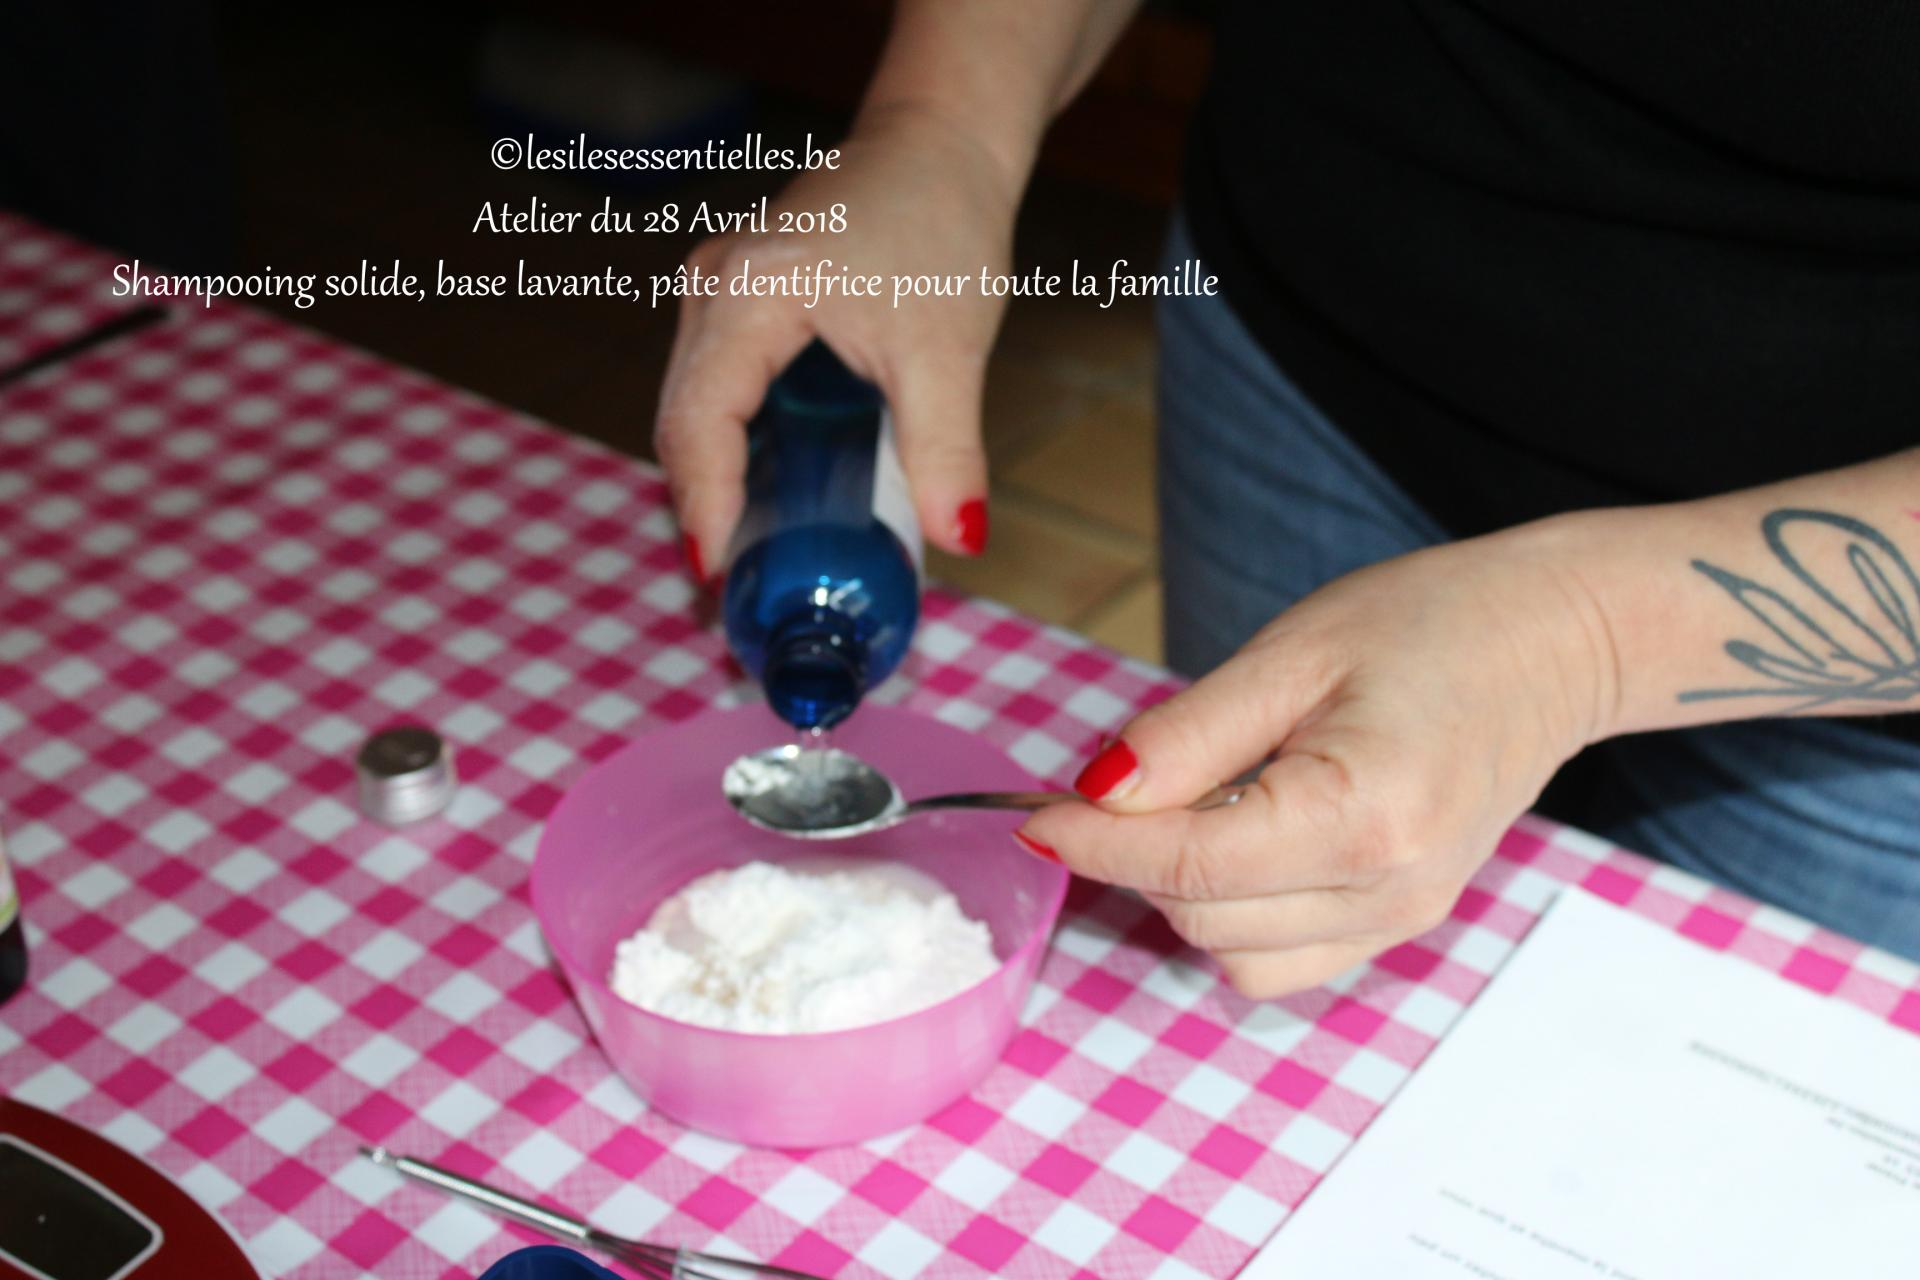 pâte dentifrice pour toute la famille